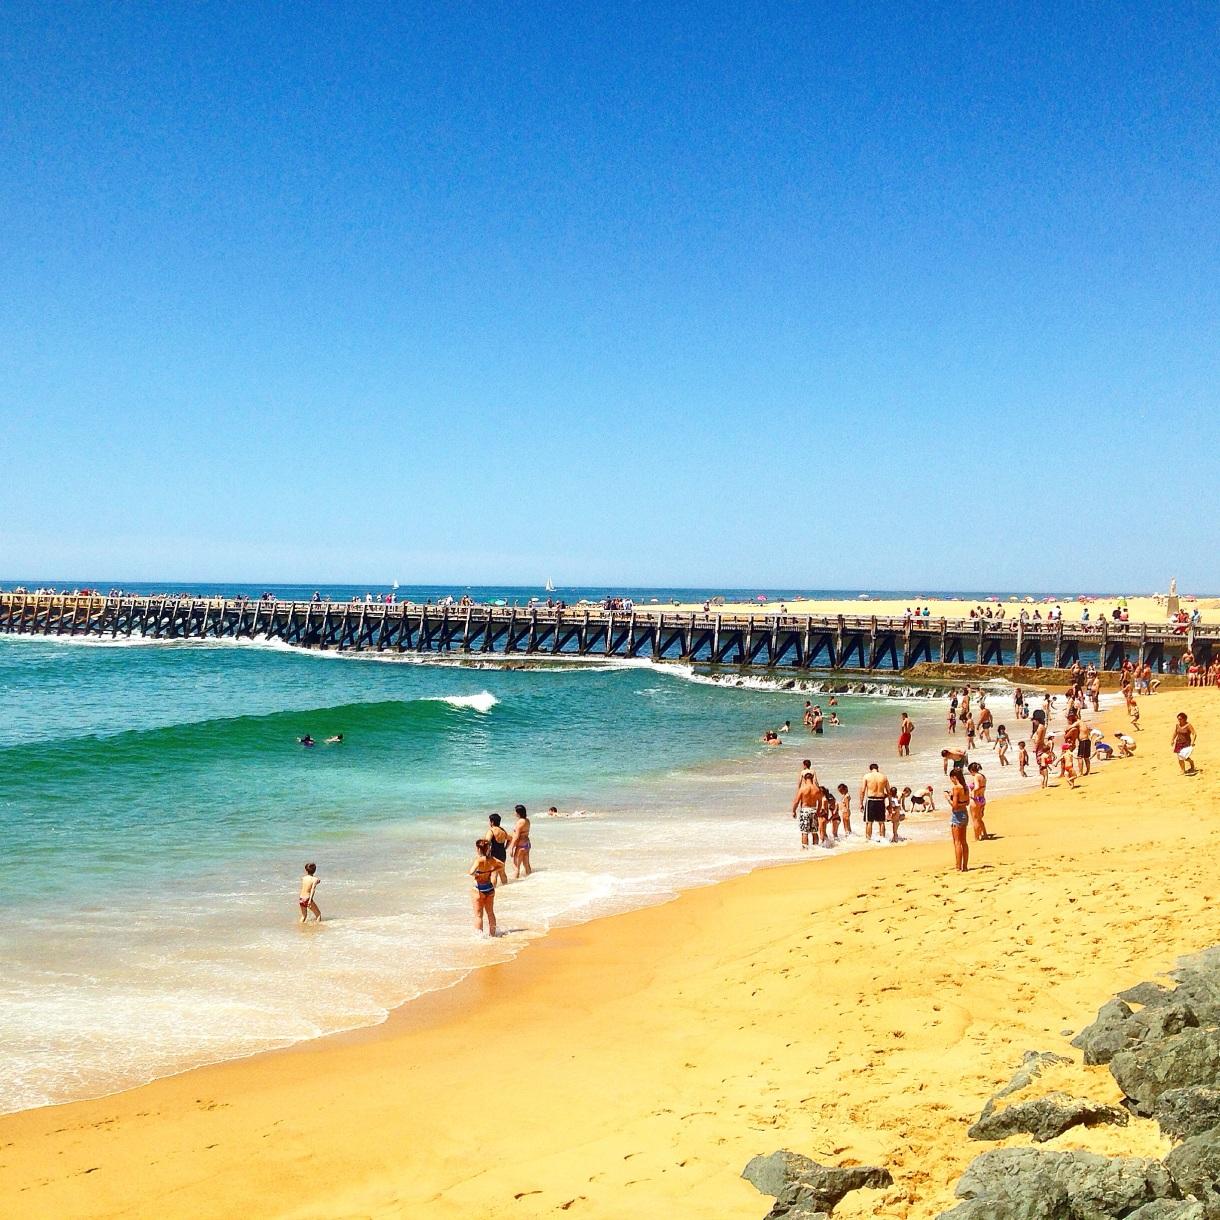 caberton Beach